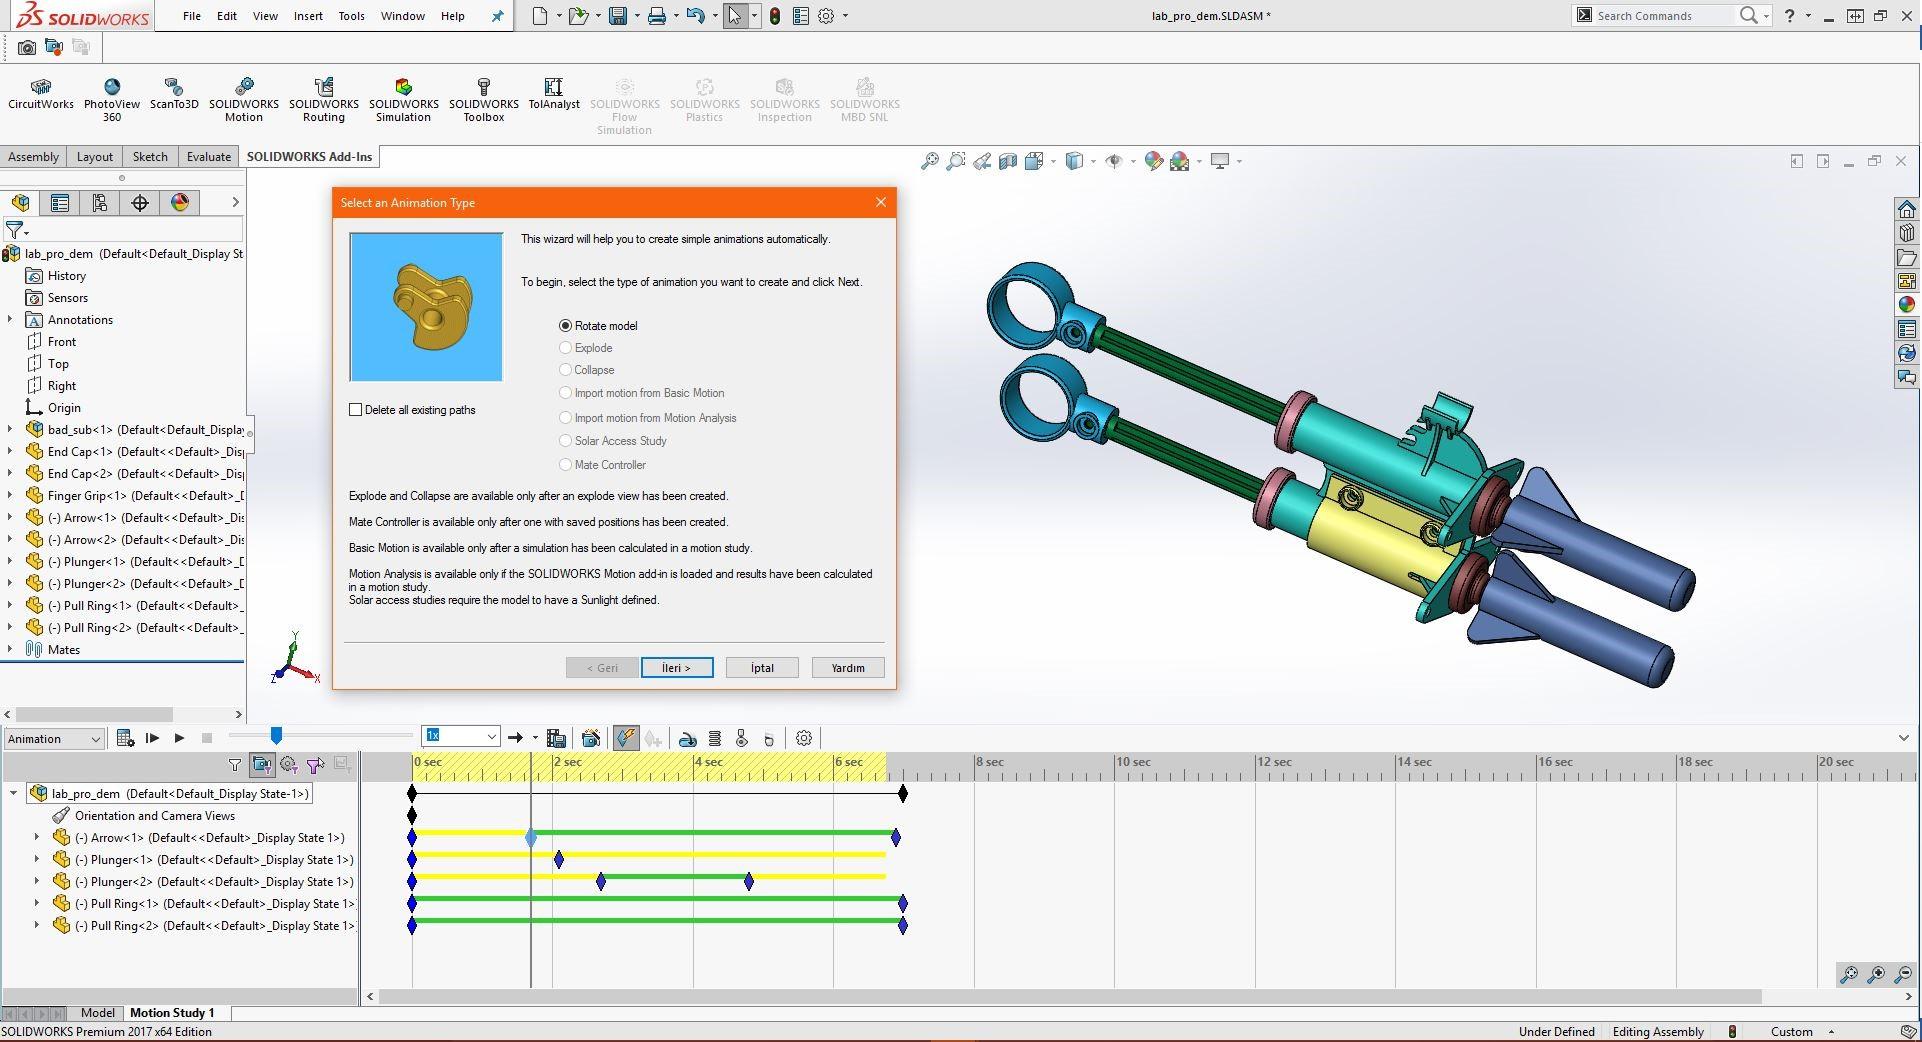 solidworks-webinar-animasyon-hazırlama